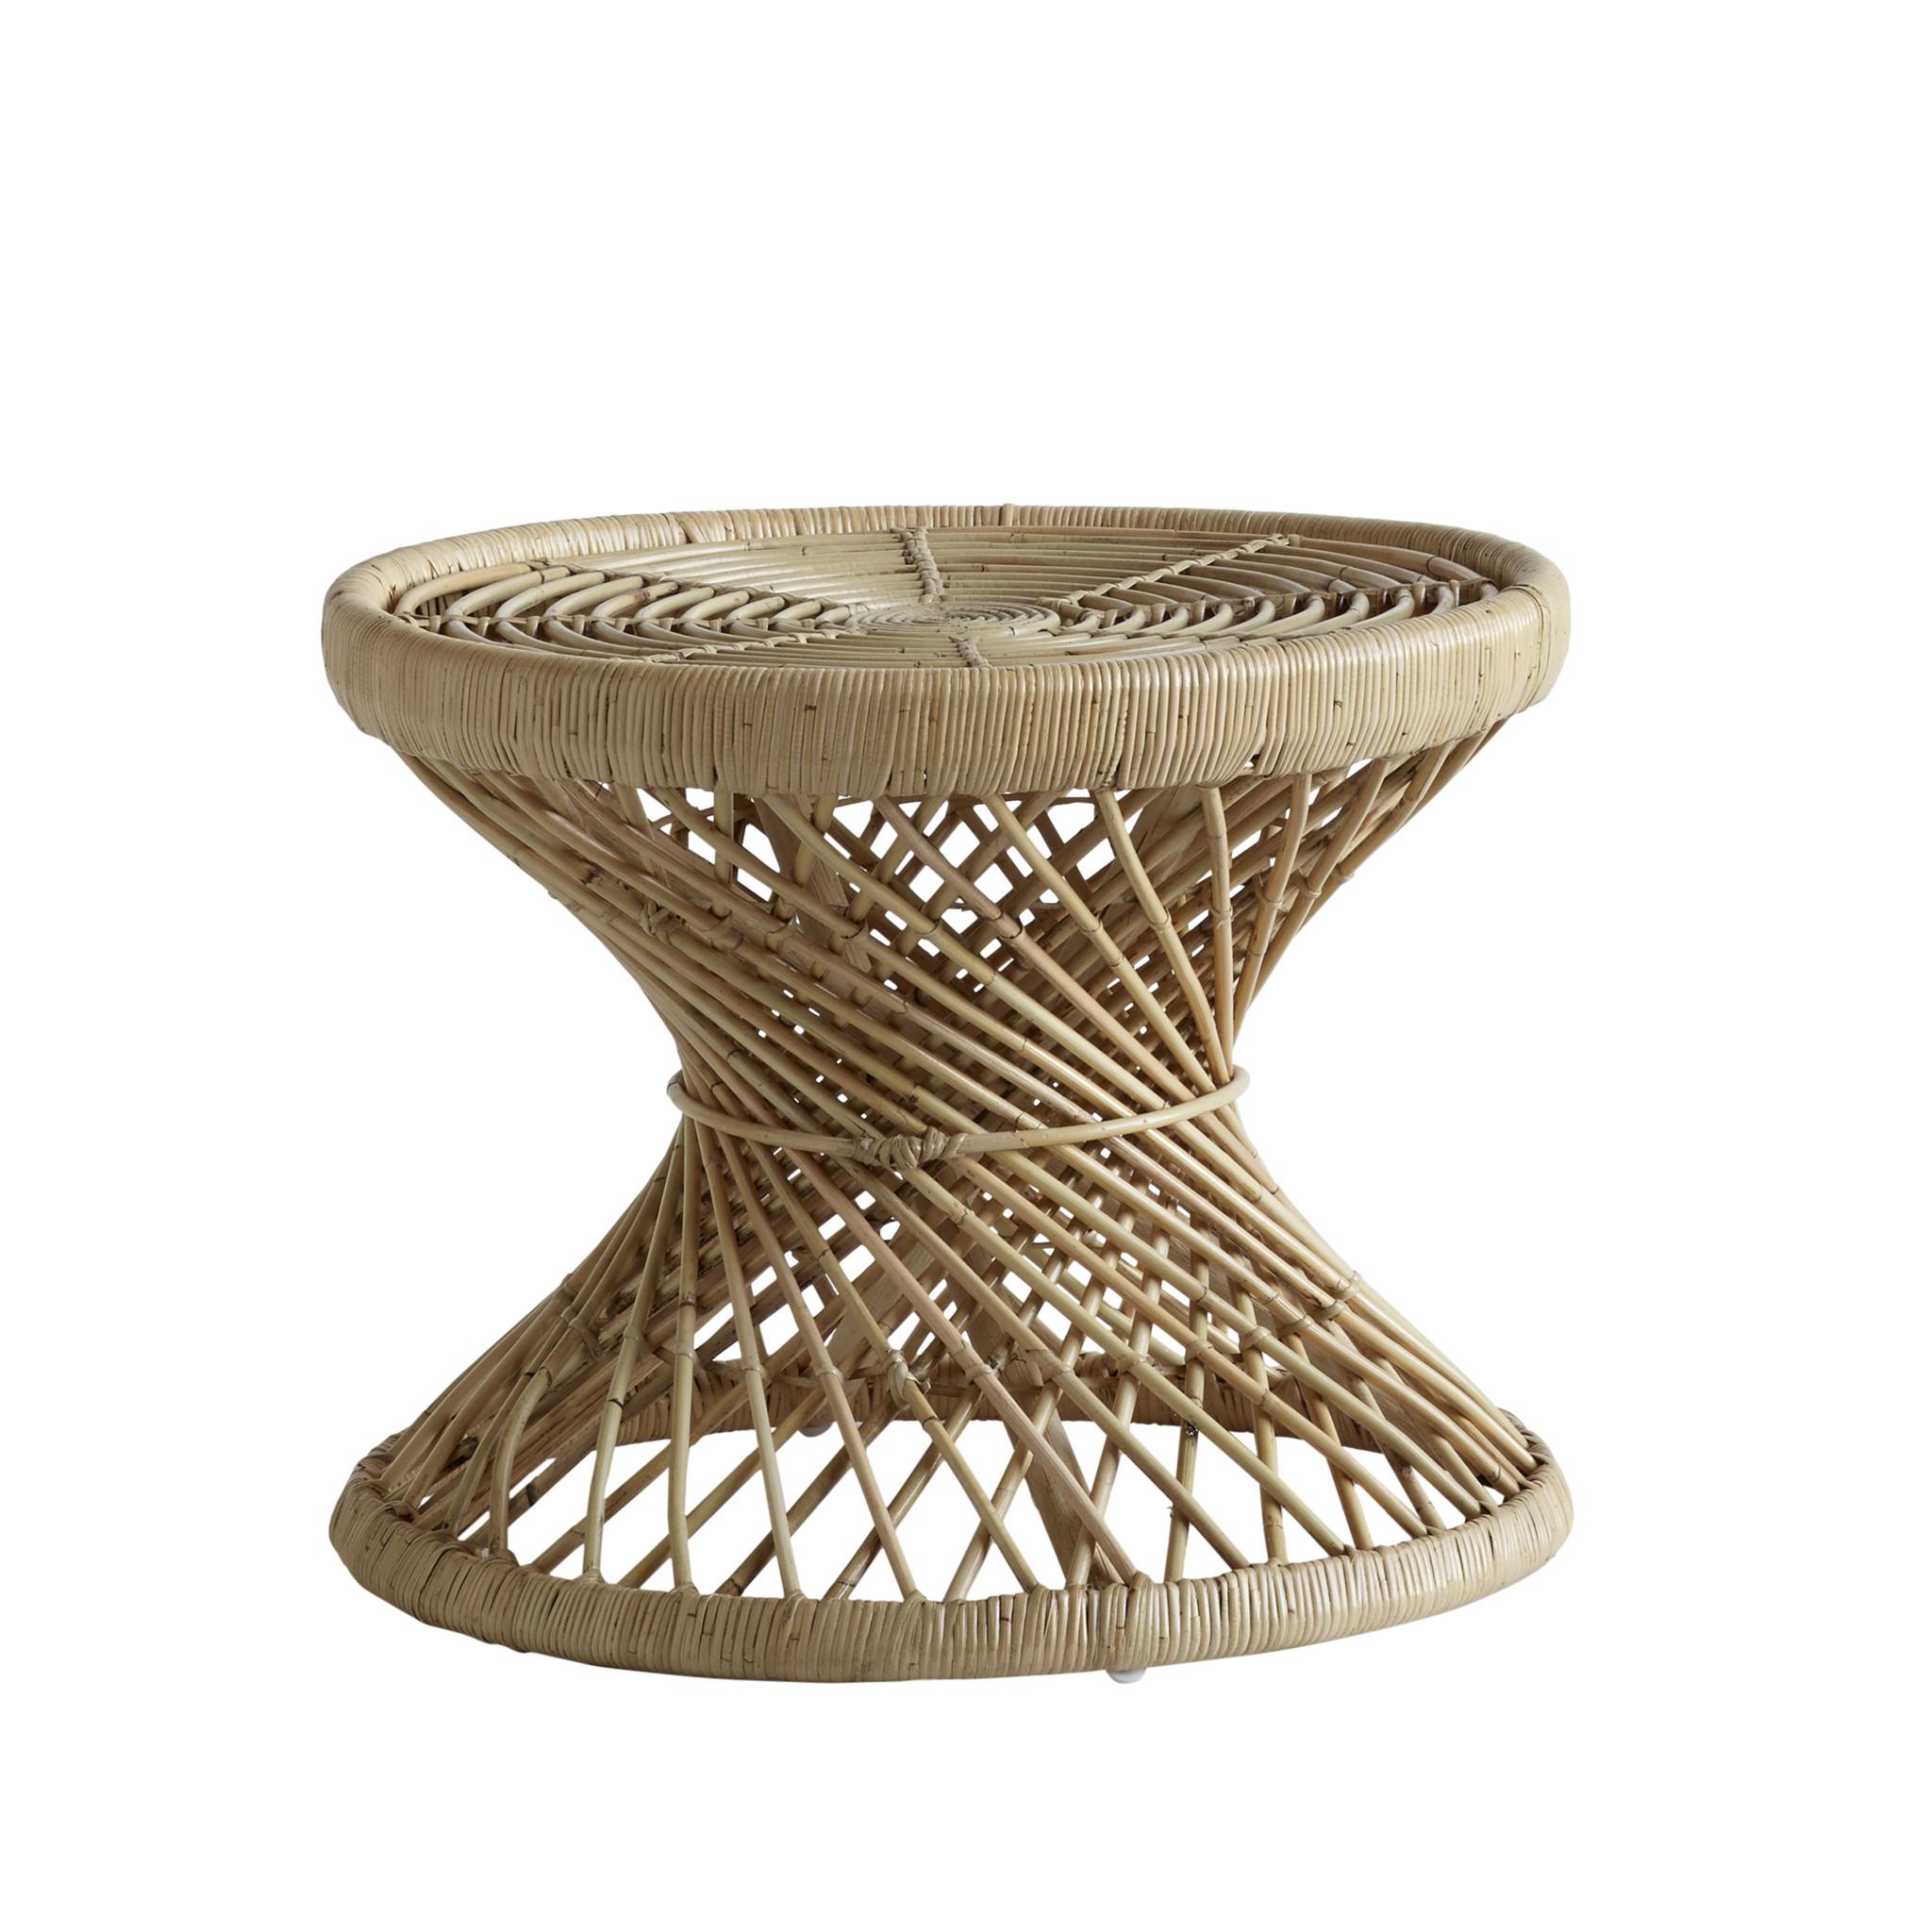 TineKHome Rattan coffee table - Natural - Ø60x47cm - TineKHome